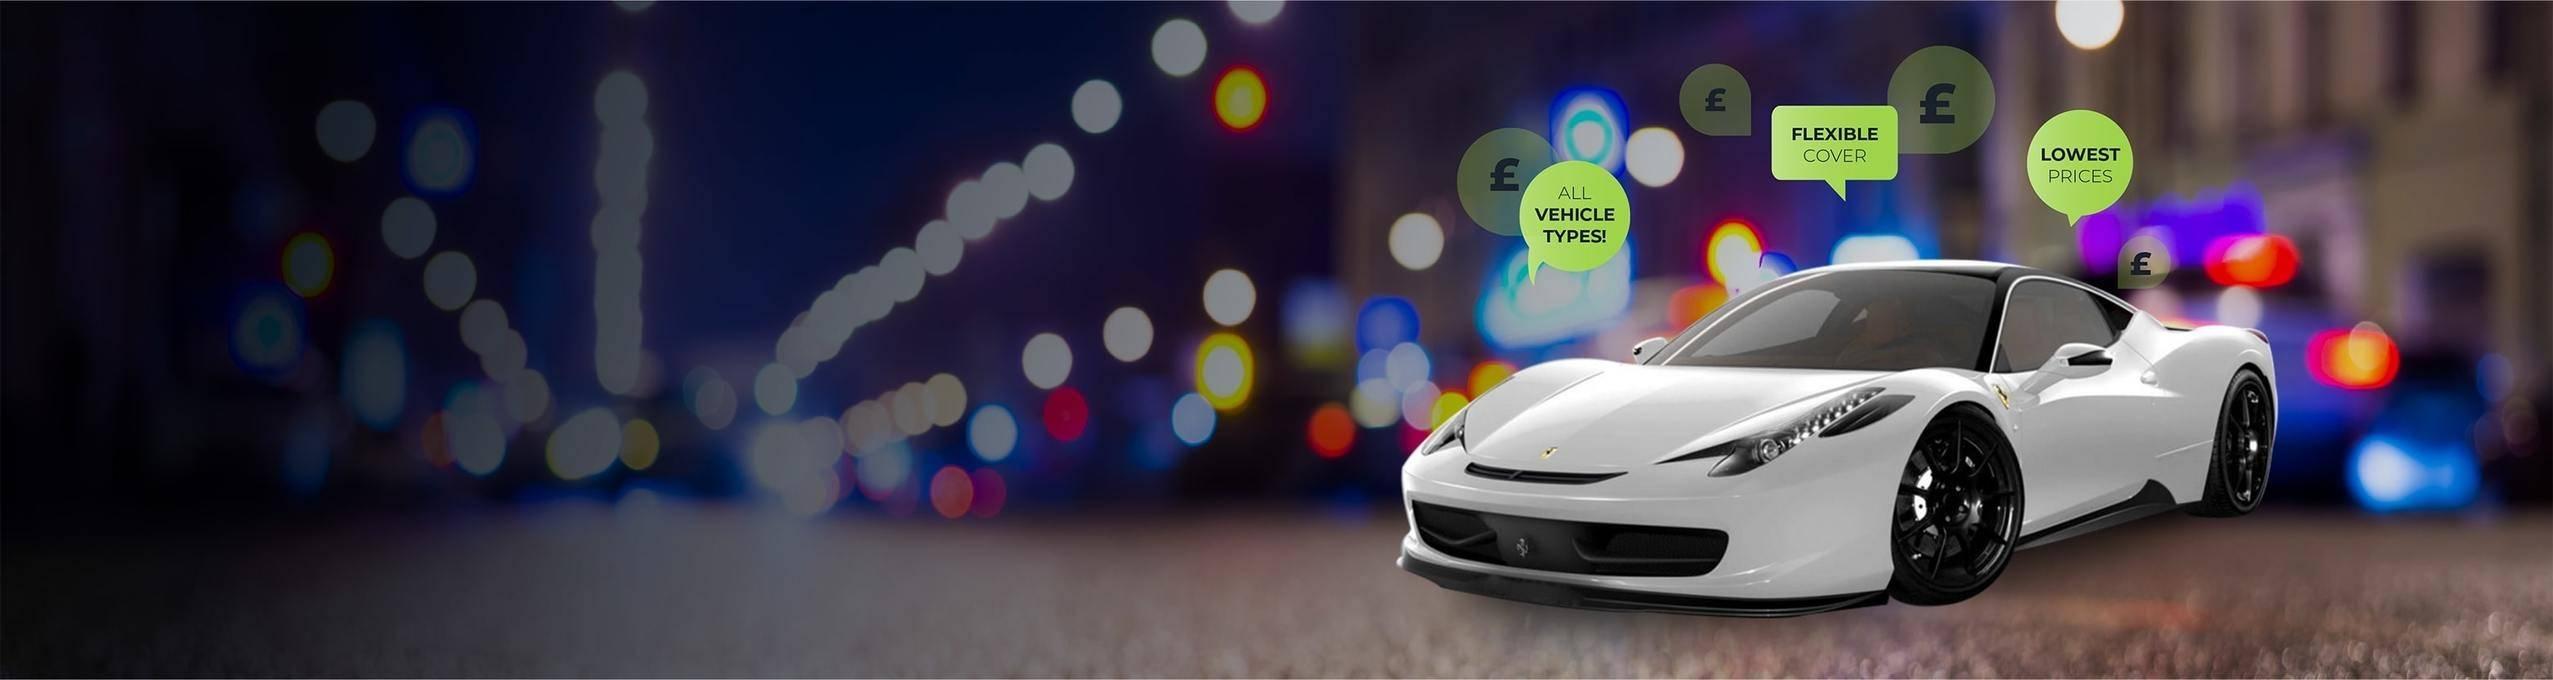 Compare Ferrari Car Insurance Deals Online Now Car Co Uk